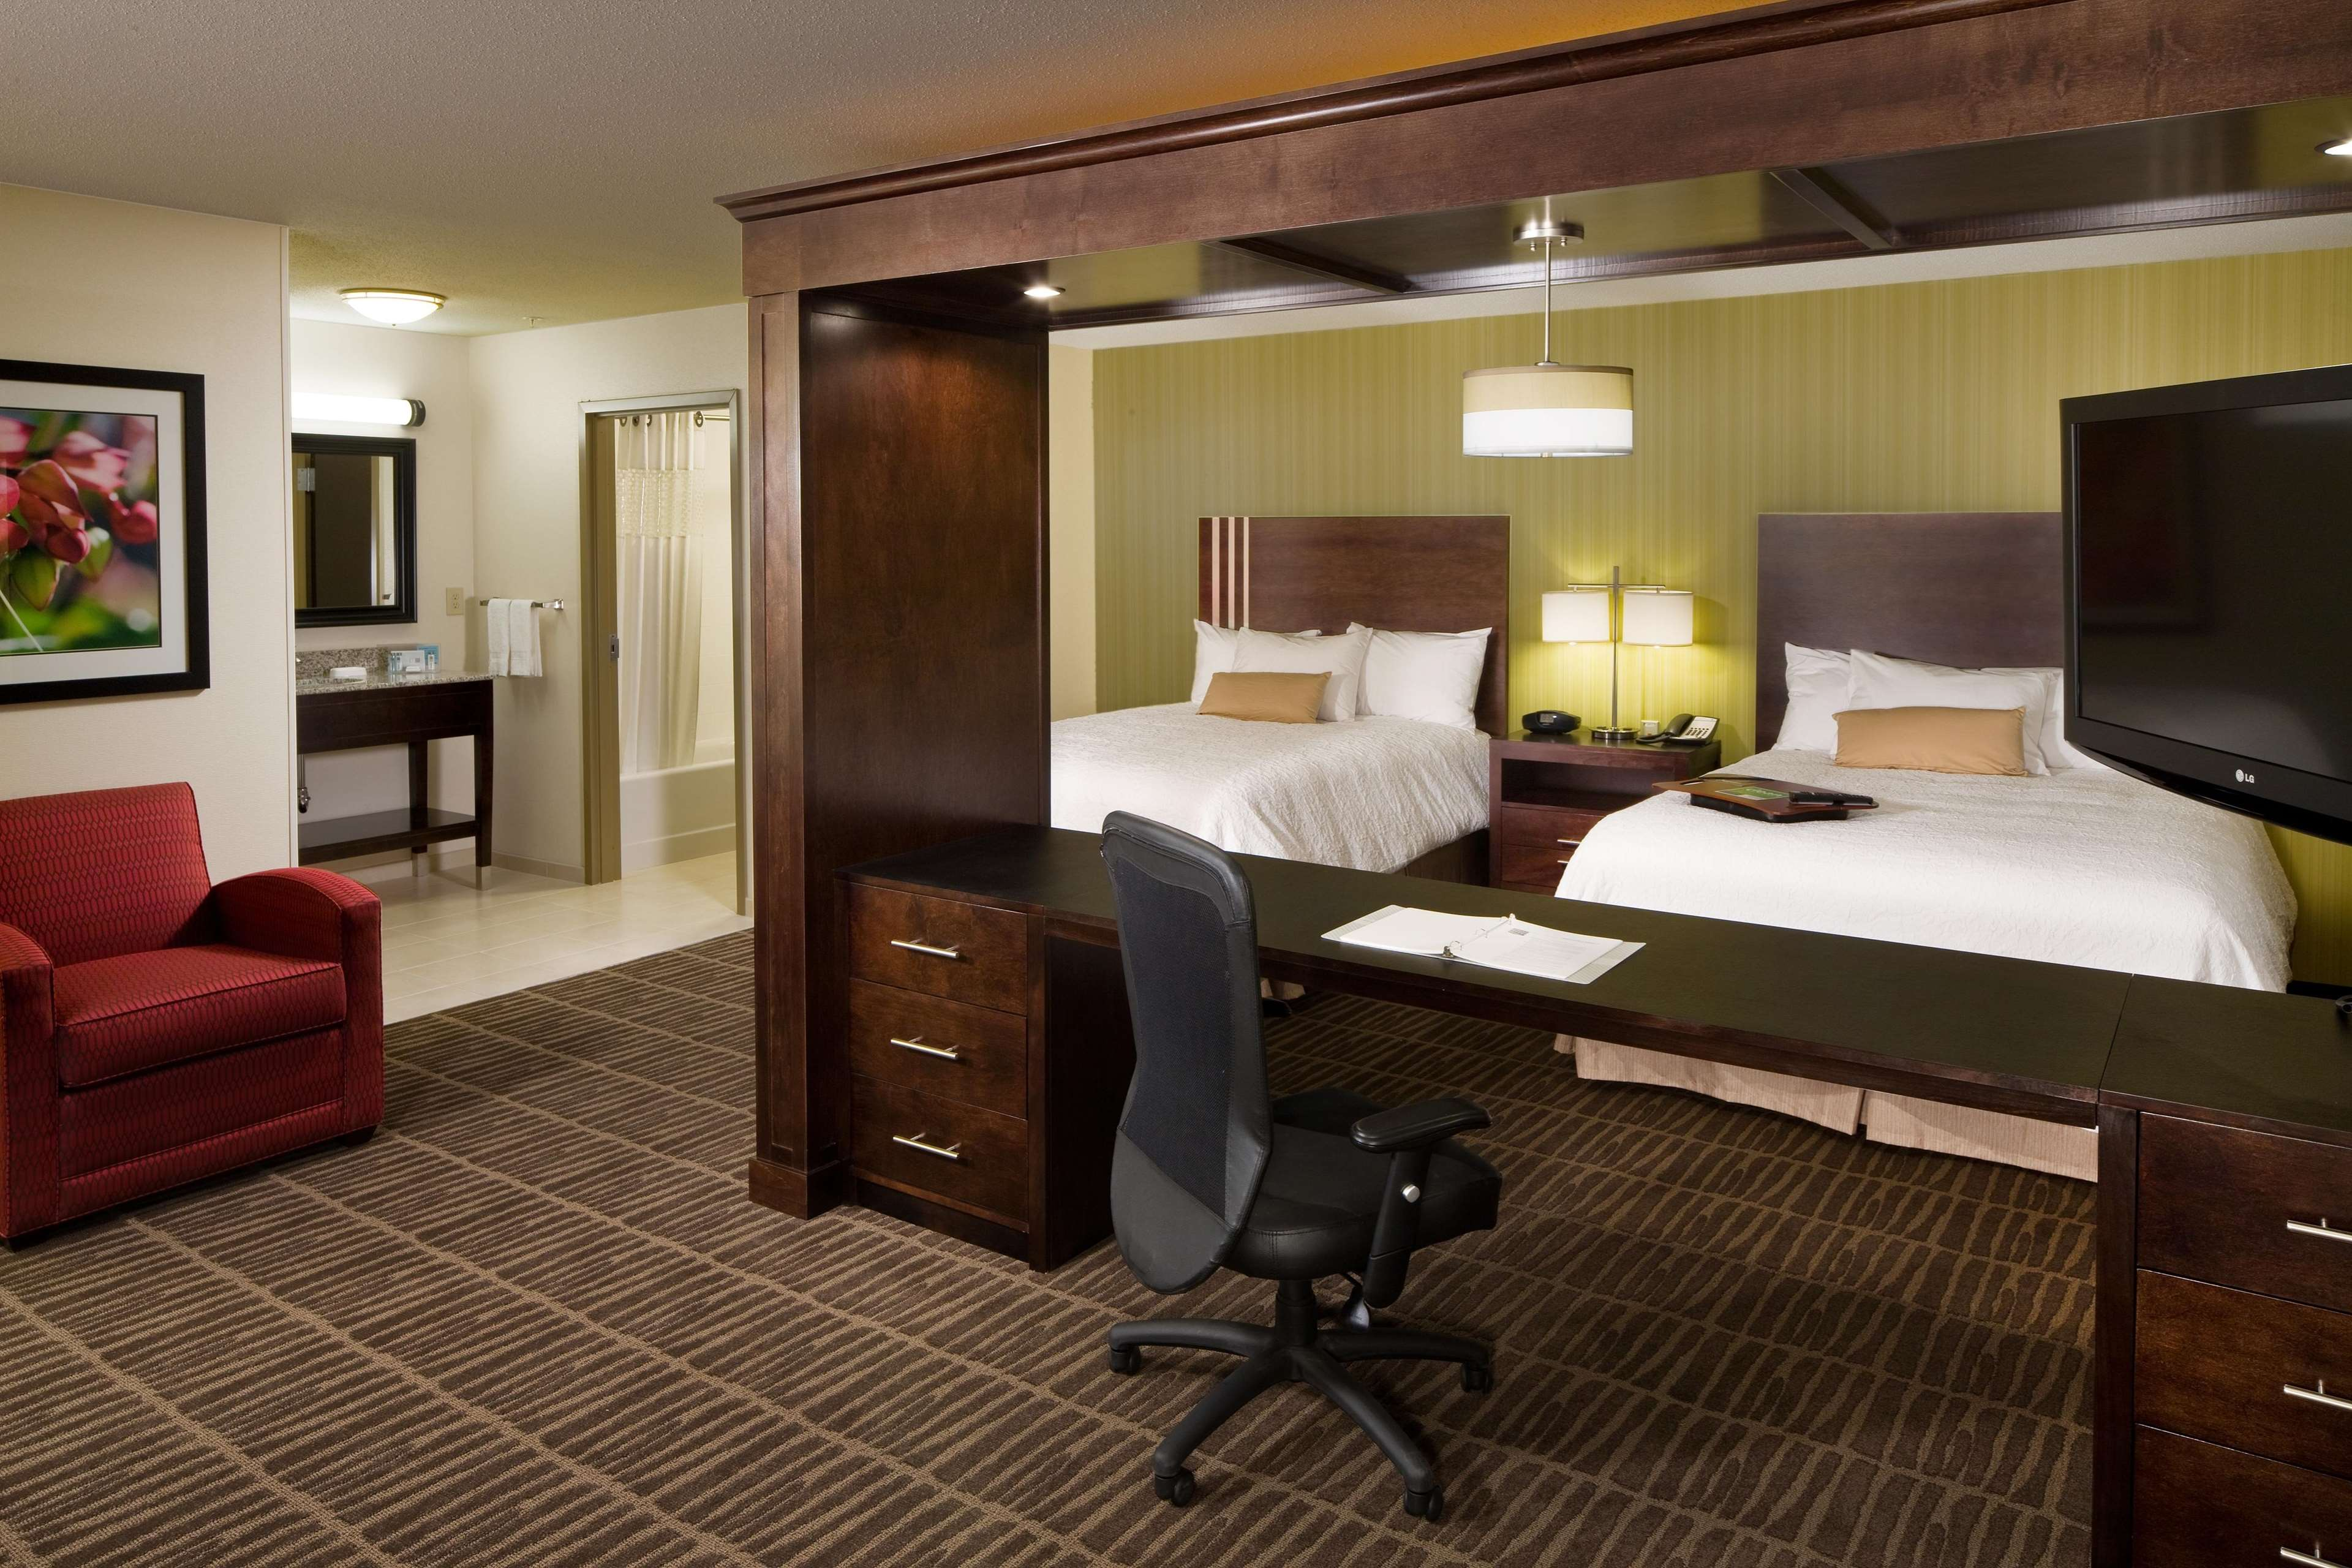 Hampton Inn & Suites Saginaw image 15